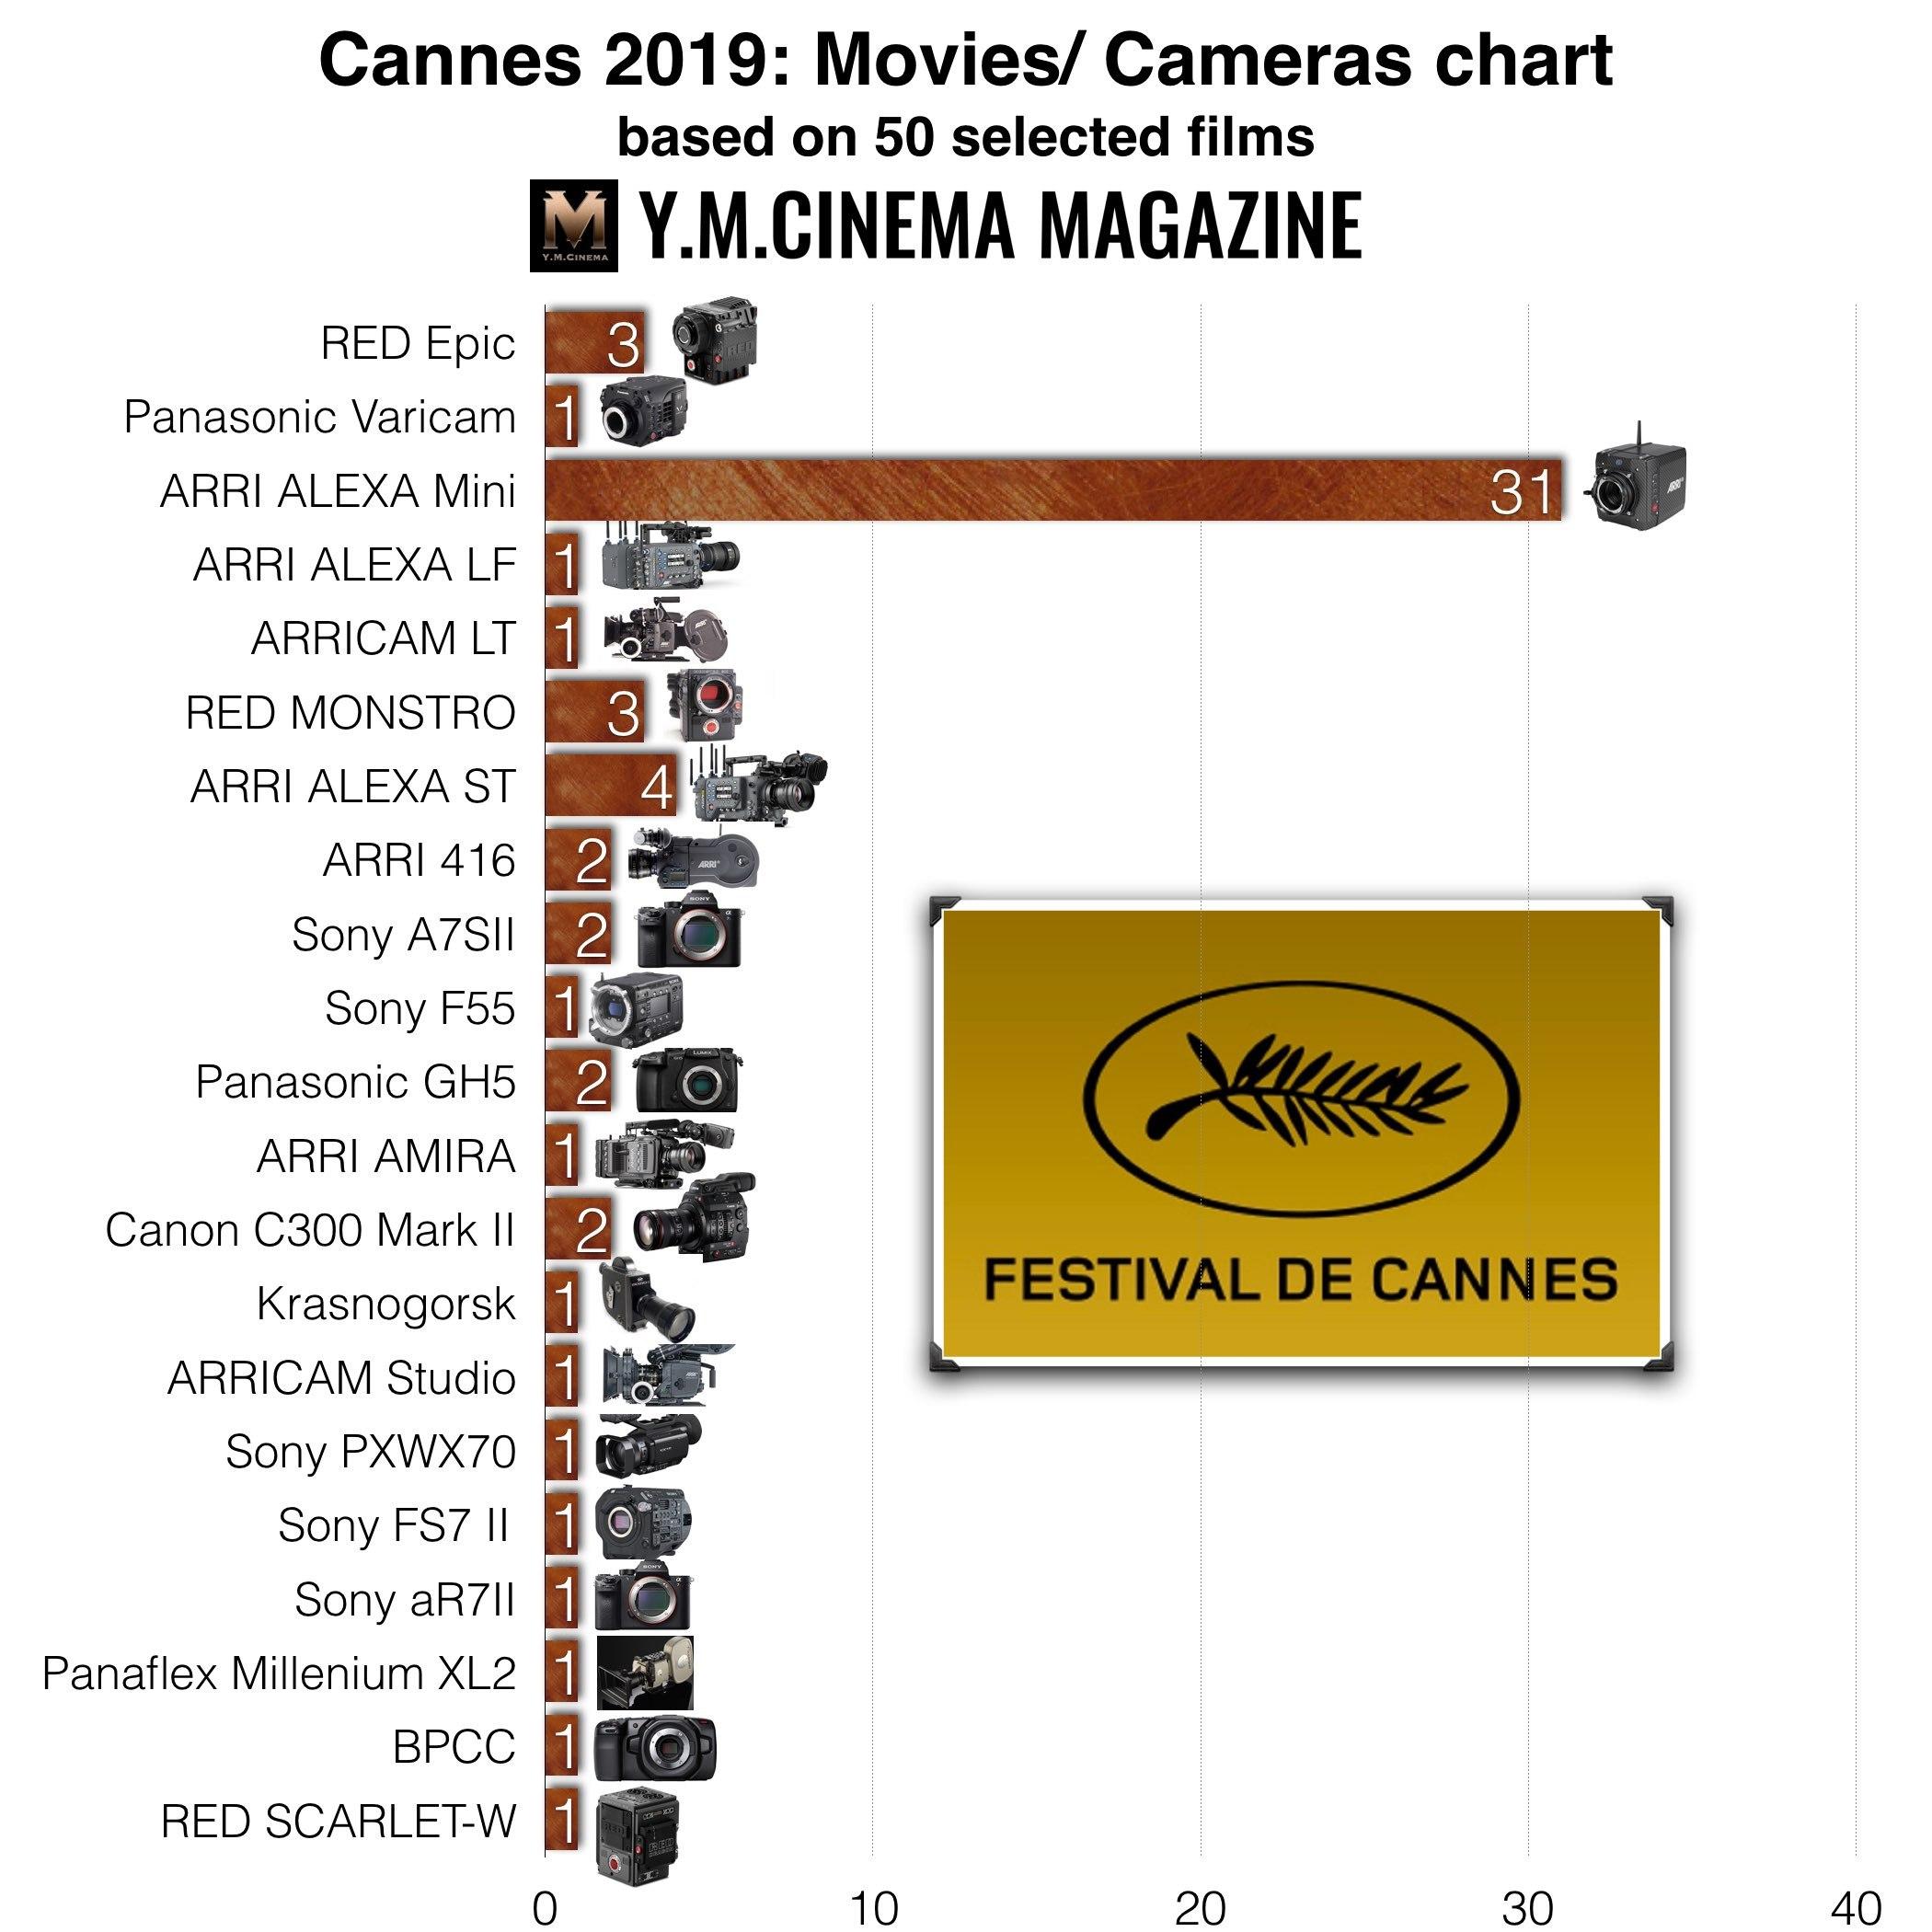 Cannes Film Festival 2019 Movies / zestawienie kamer